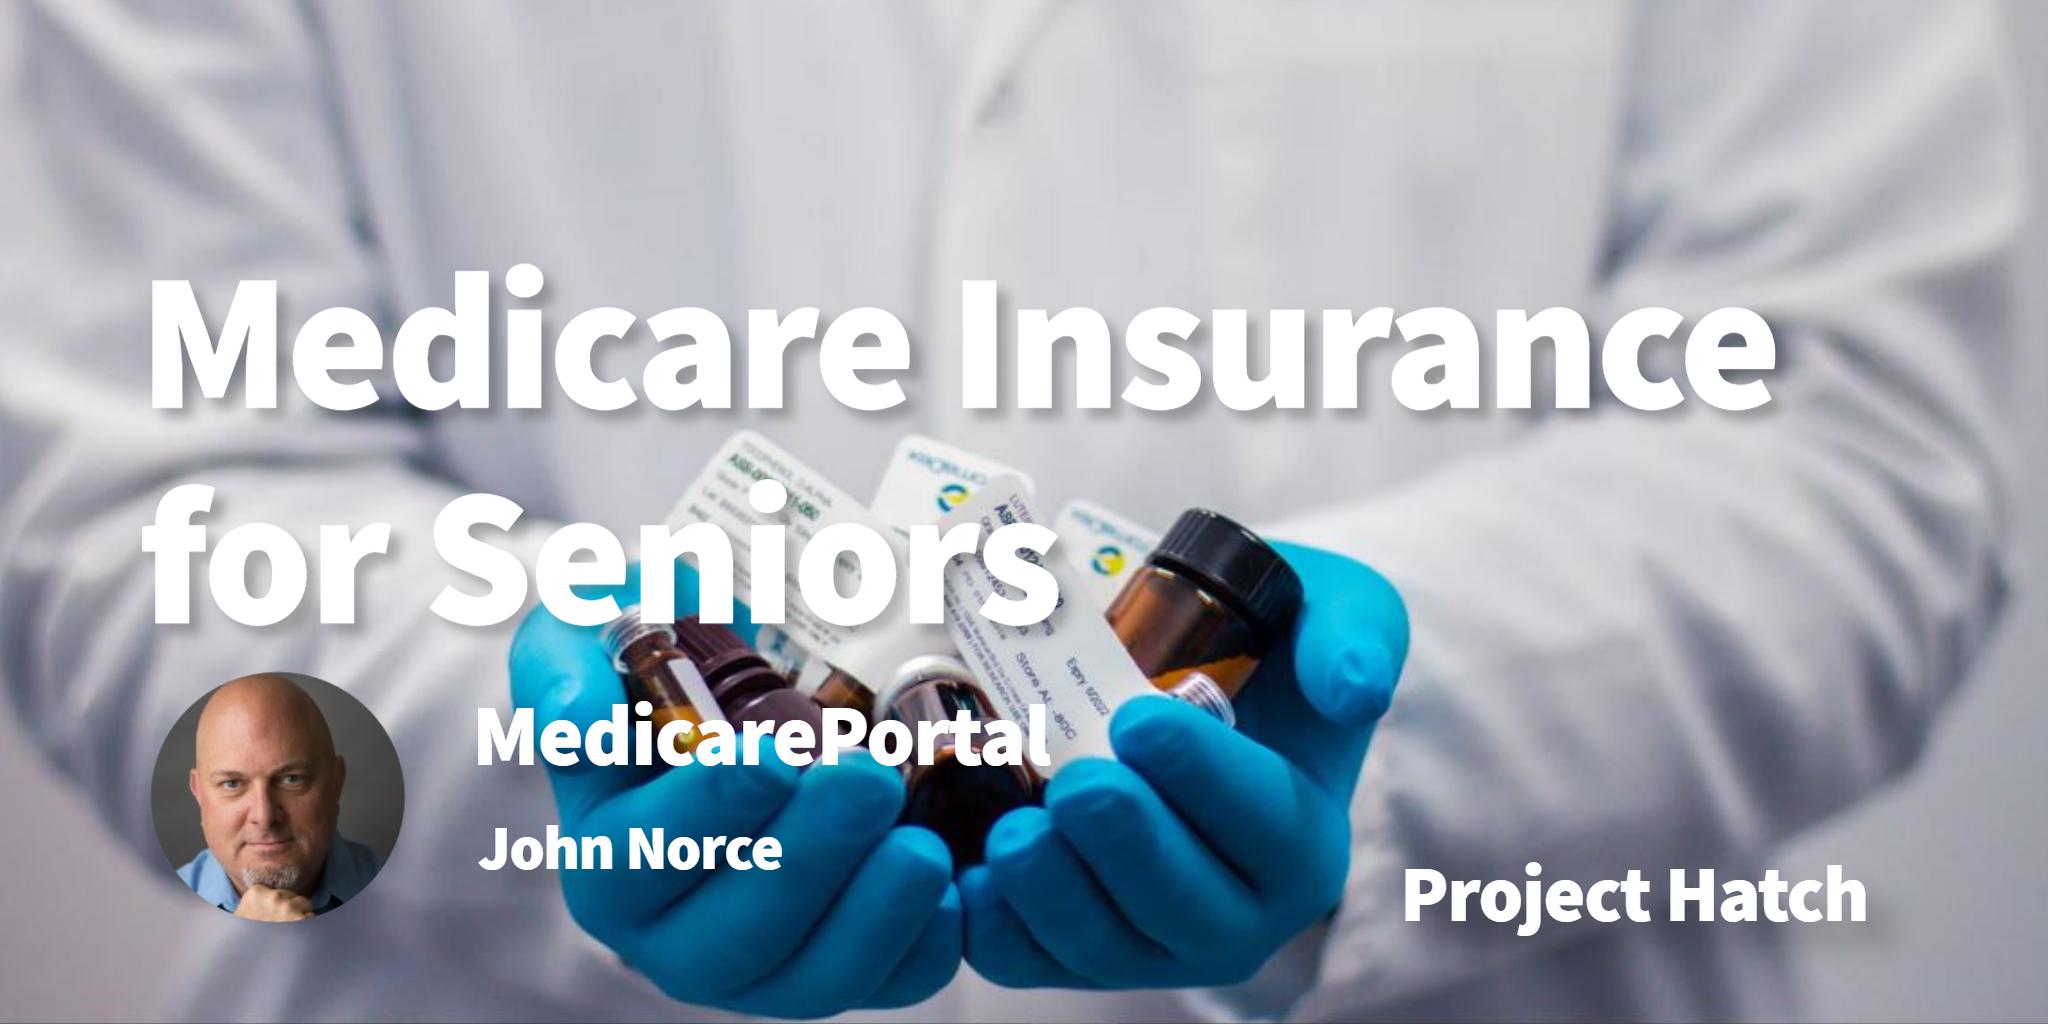 MedicarePortal John Norce